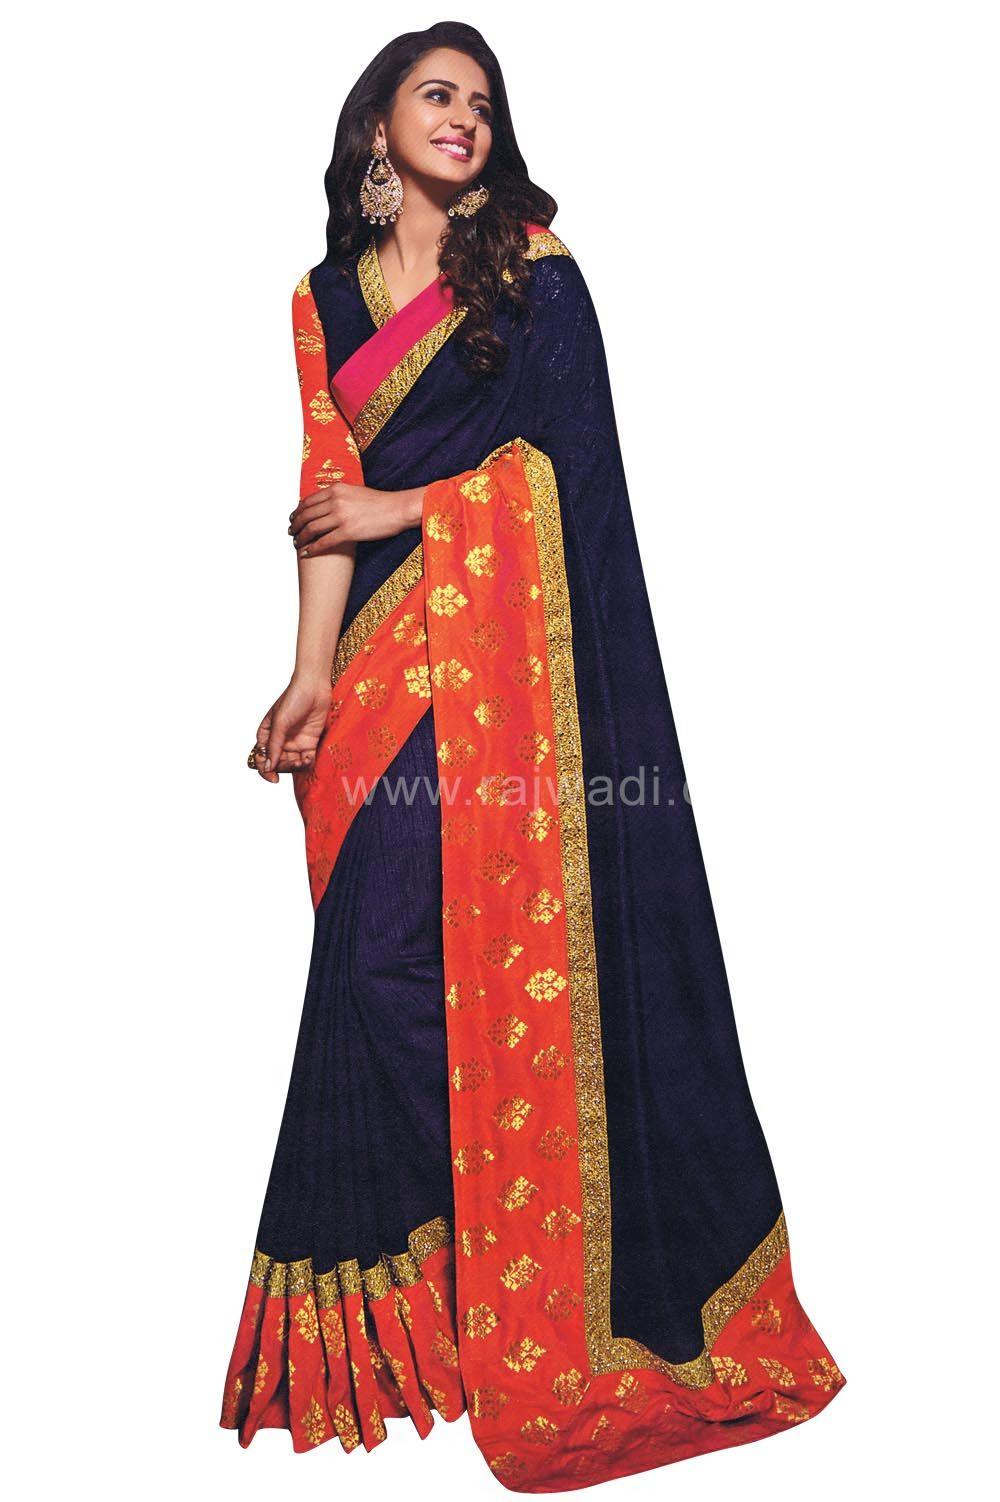 5b49af9289a13 Navy Blue and Orange Color Silk Saree worn by Rakhul Preet....  rakhulpreet   orange  blue  saree  designer  partywear  rajwadi  womensfashion   sareefashion ...